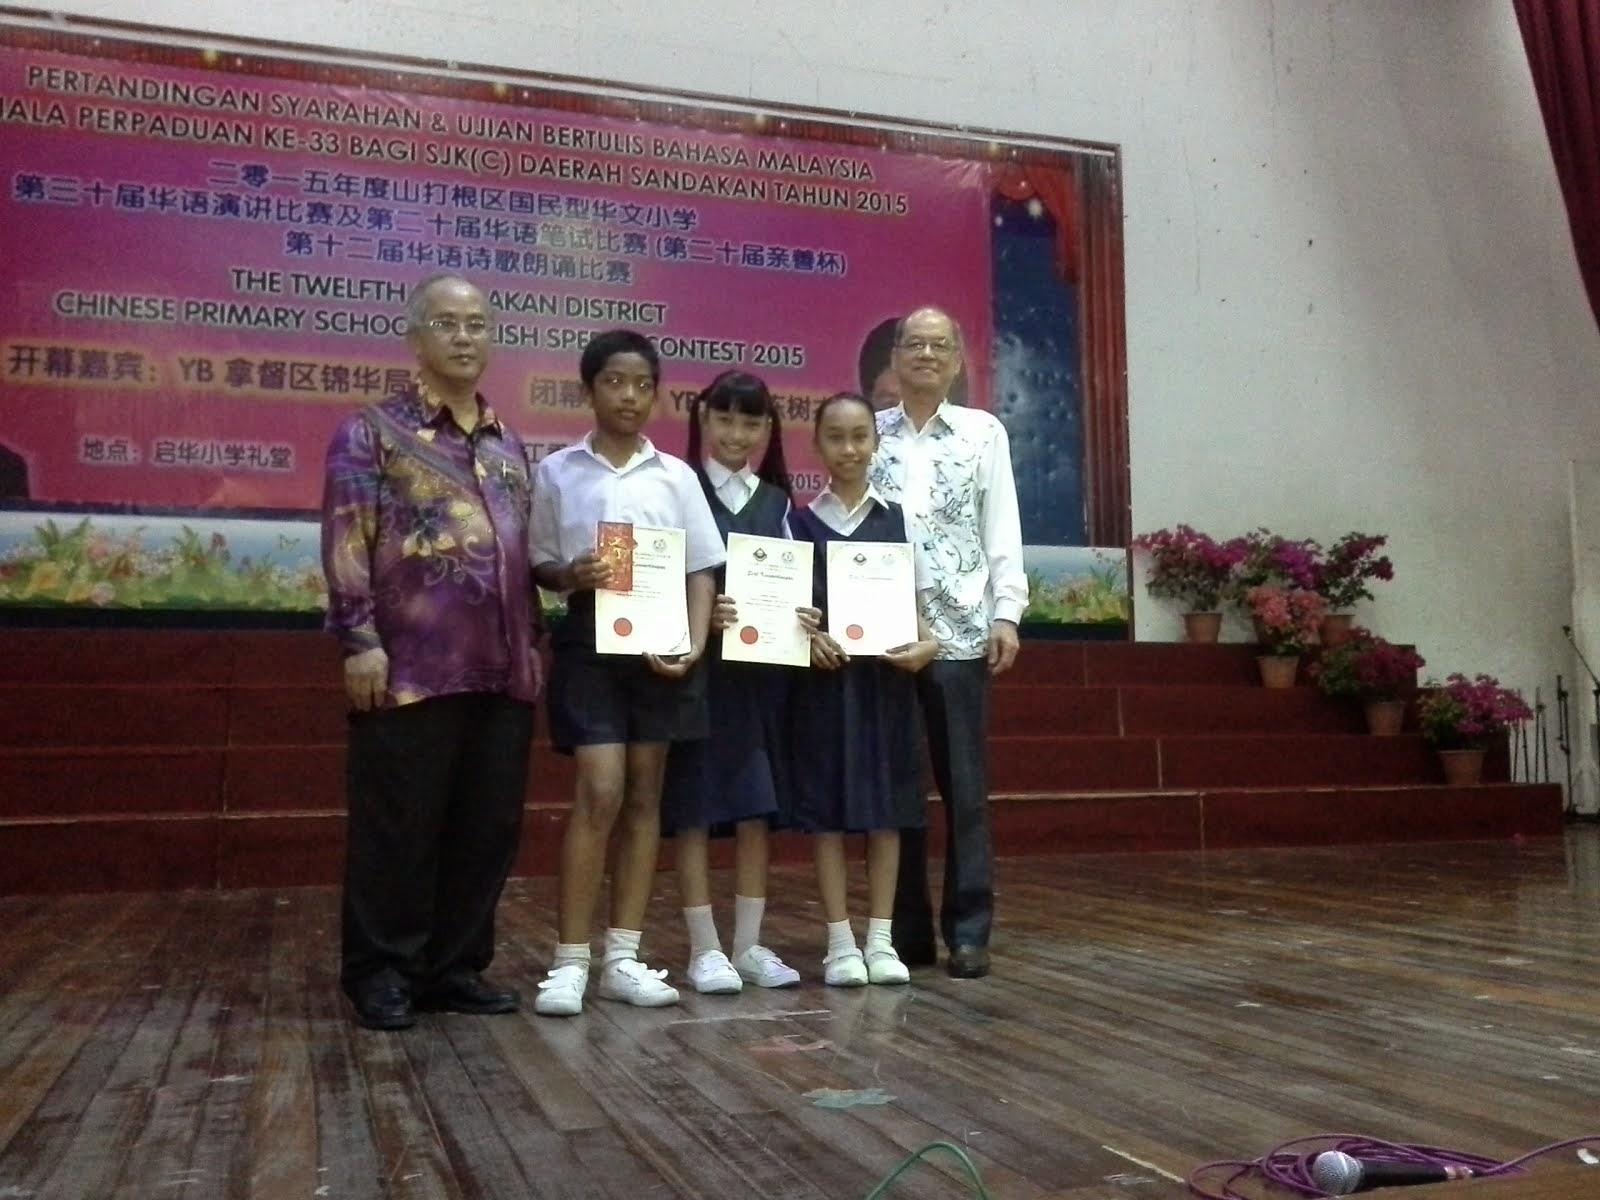 2015年山打根区国语笔试比赛   Ujian Bertulis Bahasa Malaysia Daerah Sandakan第五名Tempat Kelima